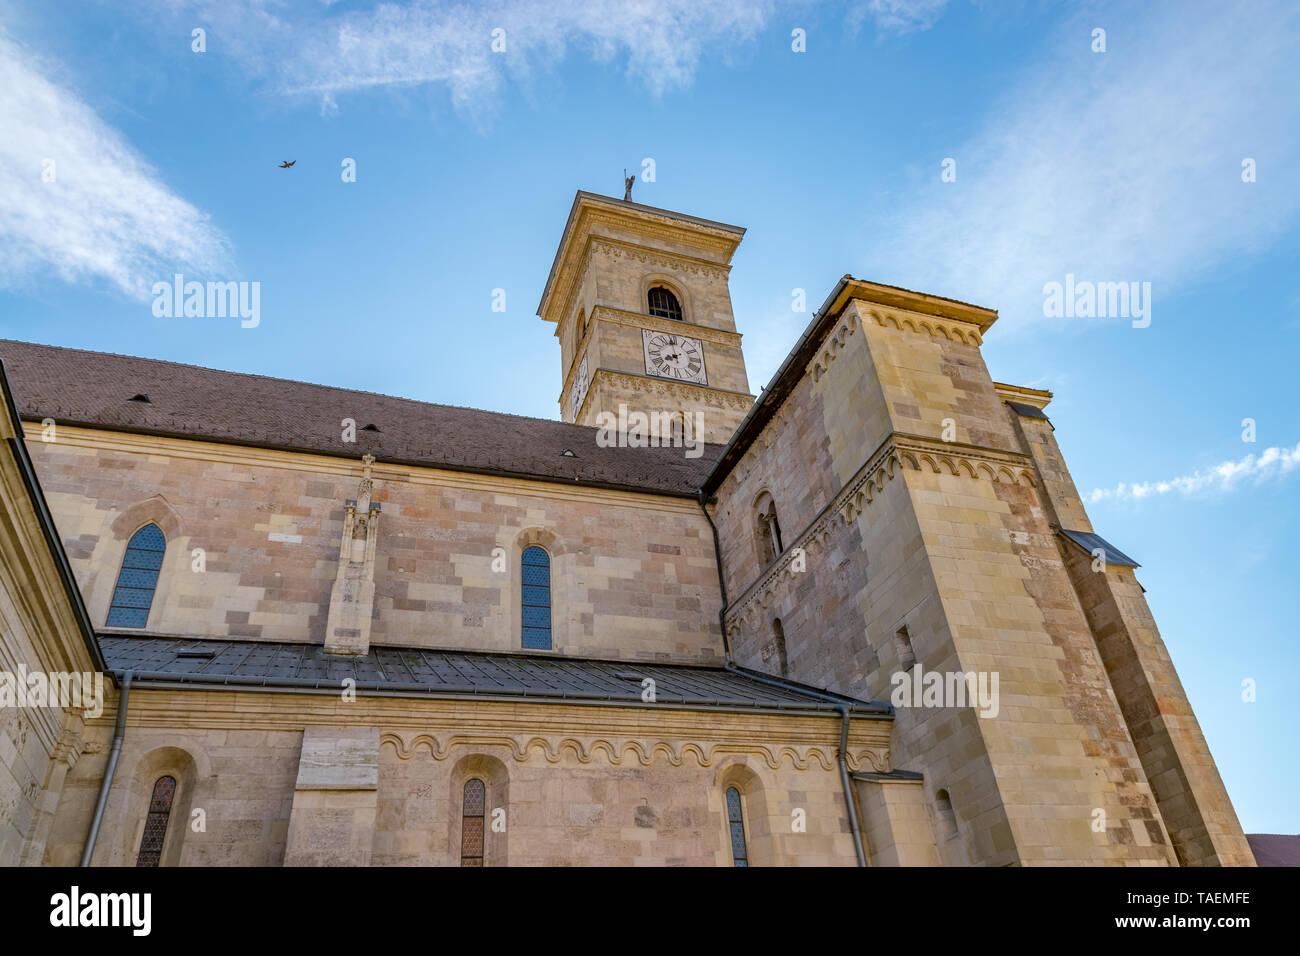 Beautiful view to the Roman-Catholic Cathedral Saint Michael in Alba Iulia city, Romania. A church a sunny day in Alba Iulia, Romania. Stock Photo